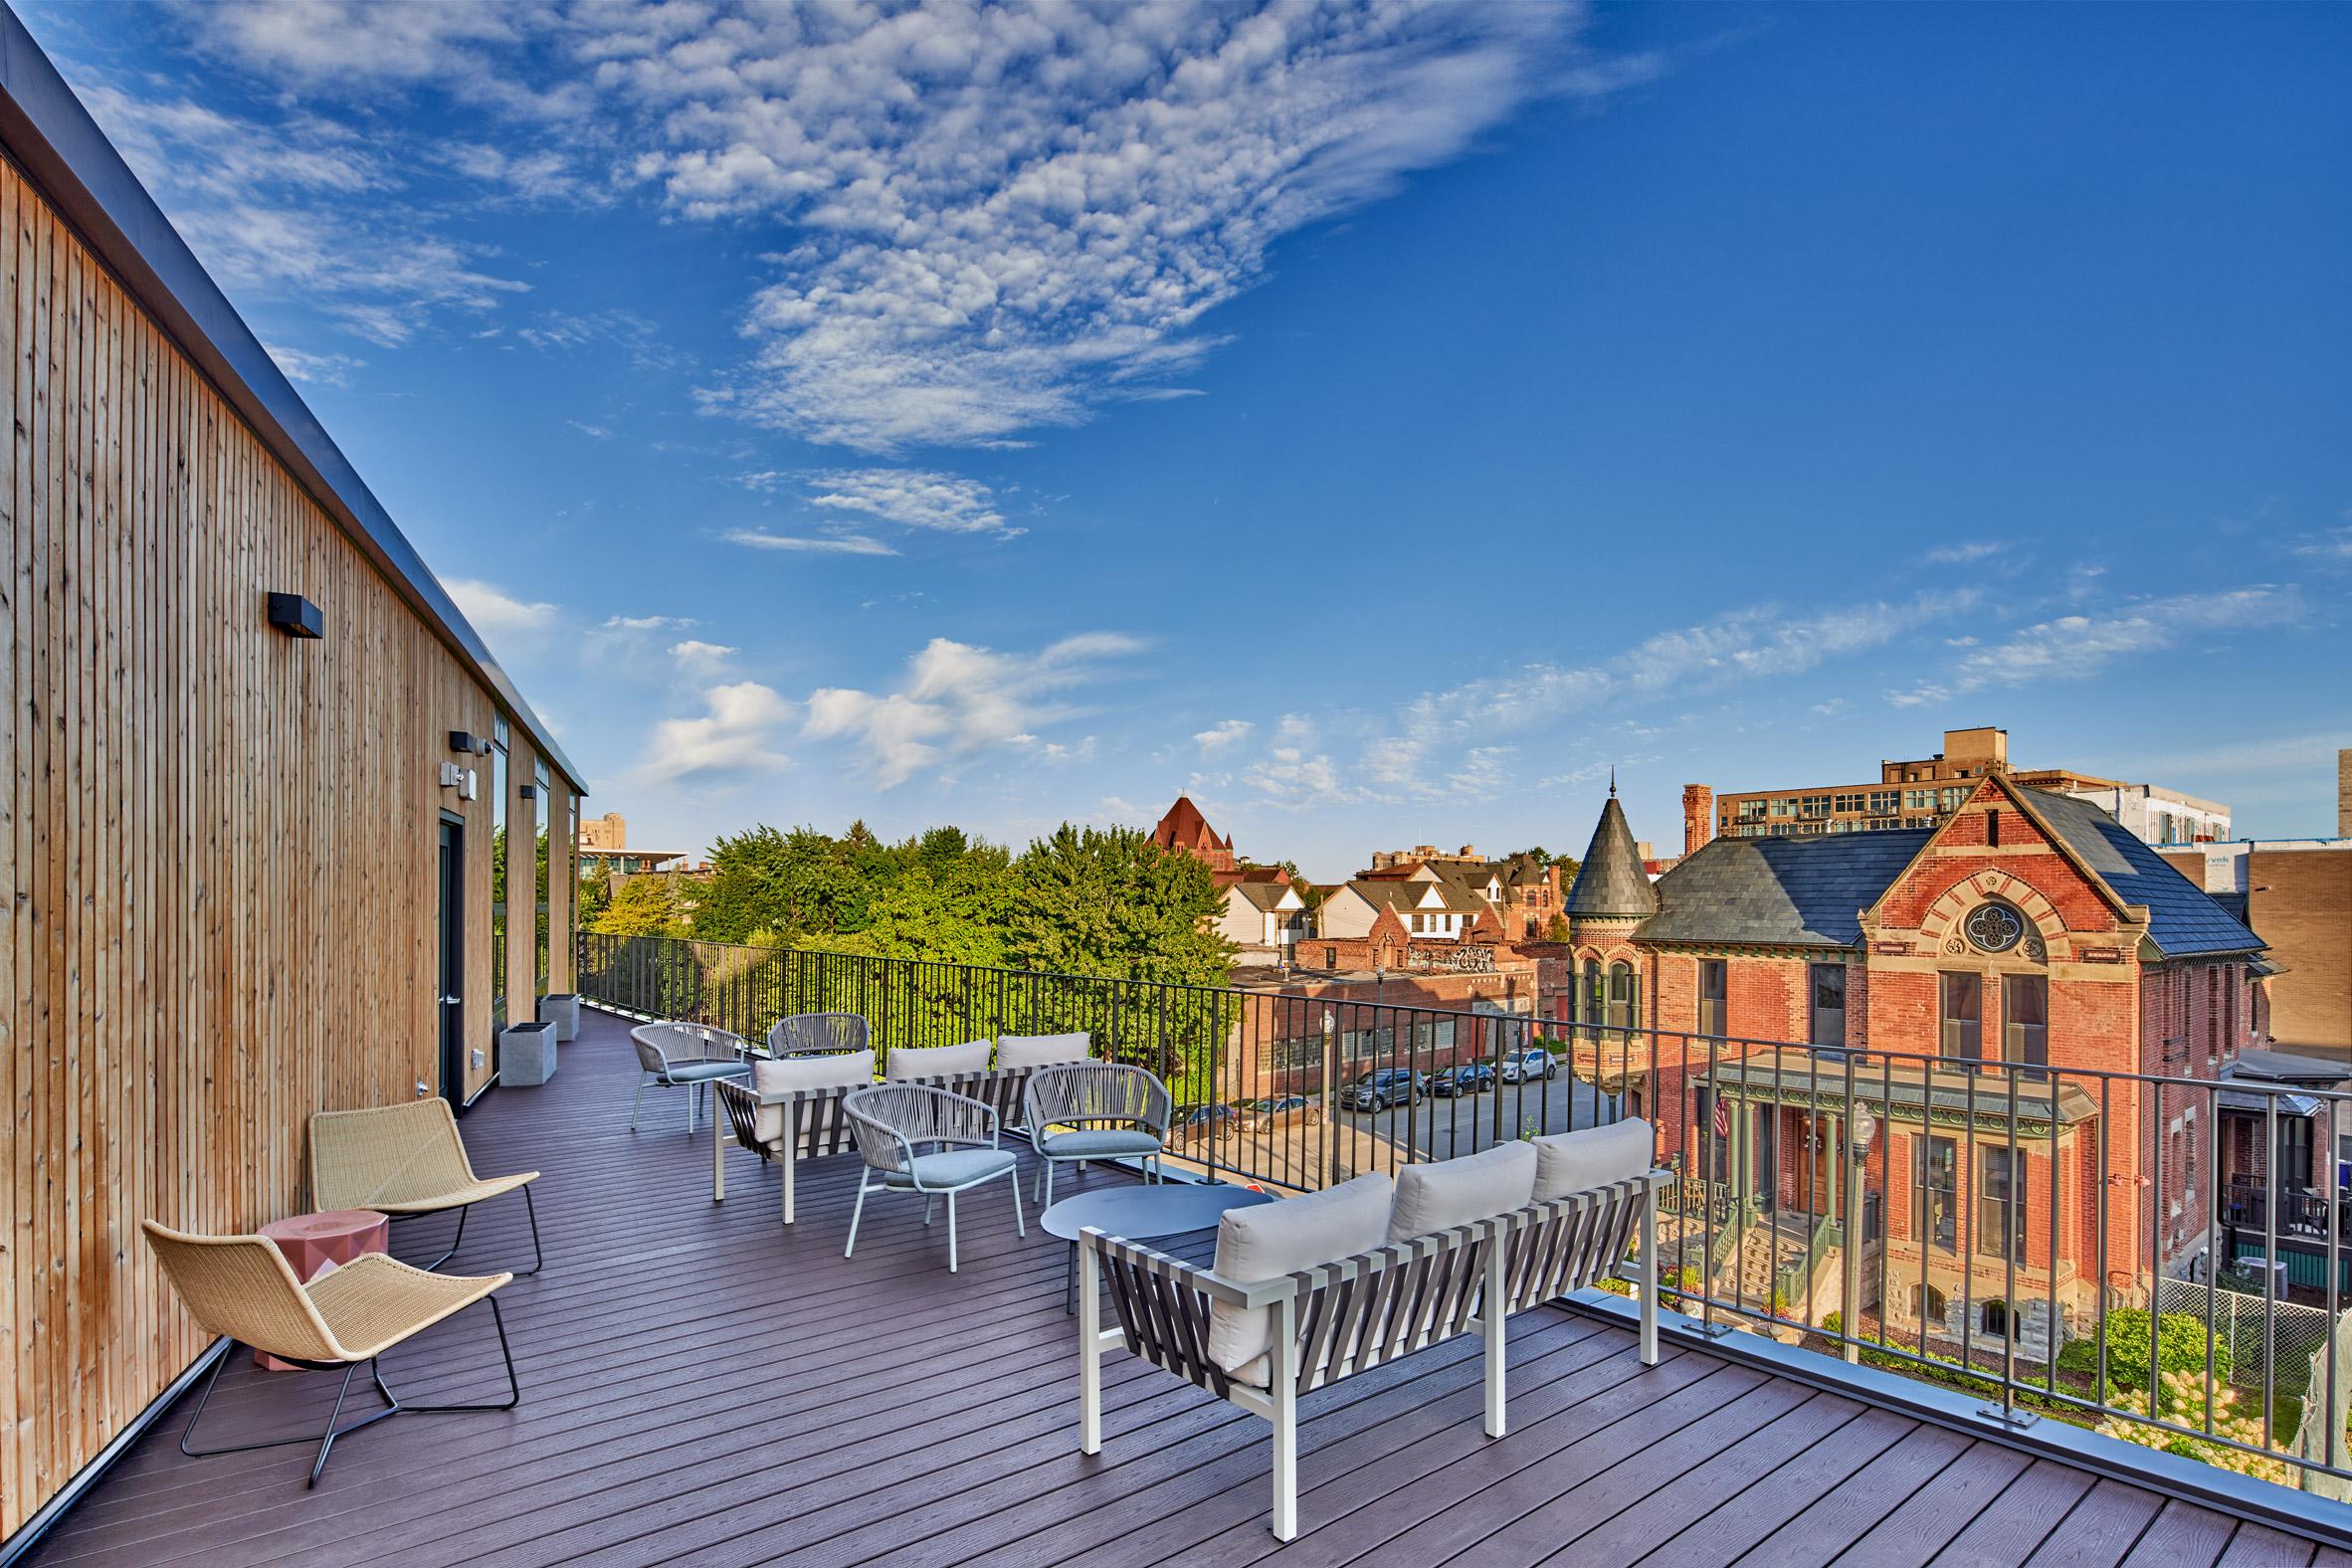 A communal terrace overlooks a vast Victorian mansion